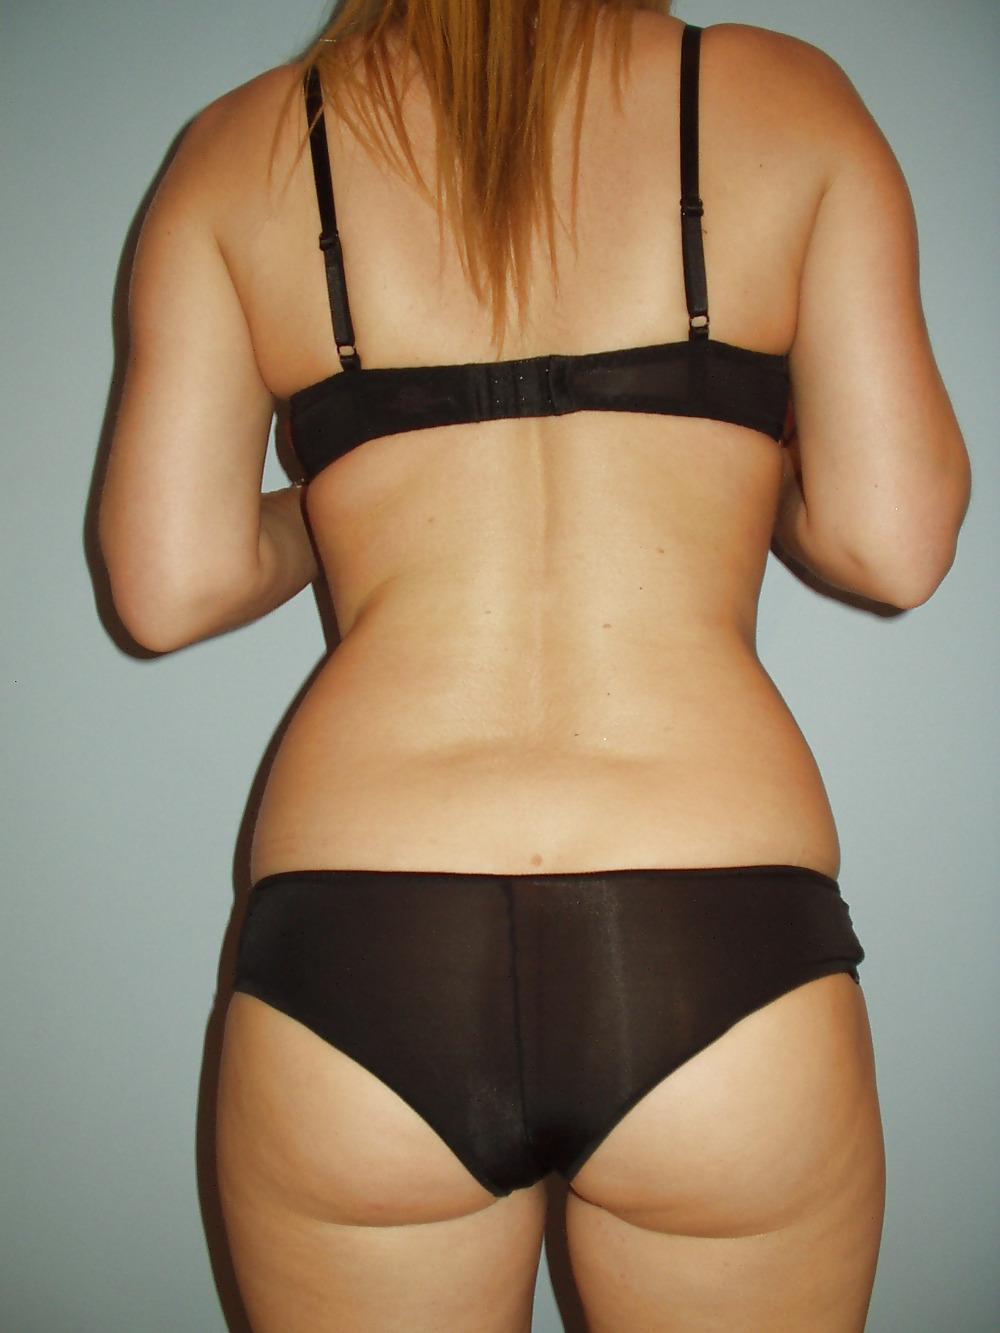 Panties for sale